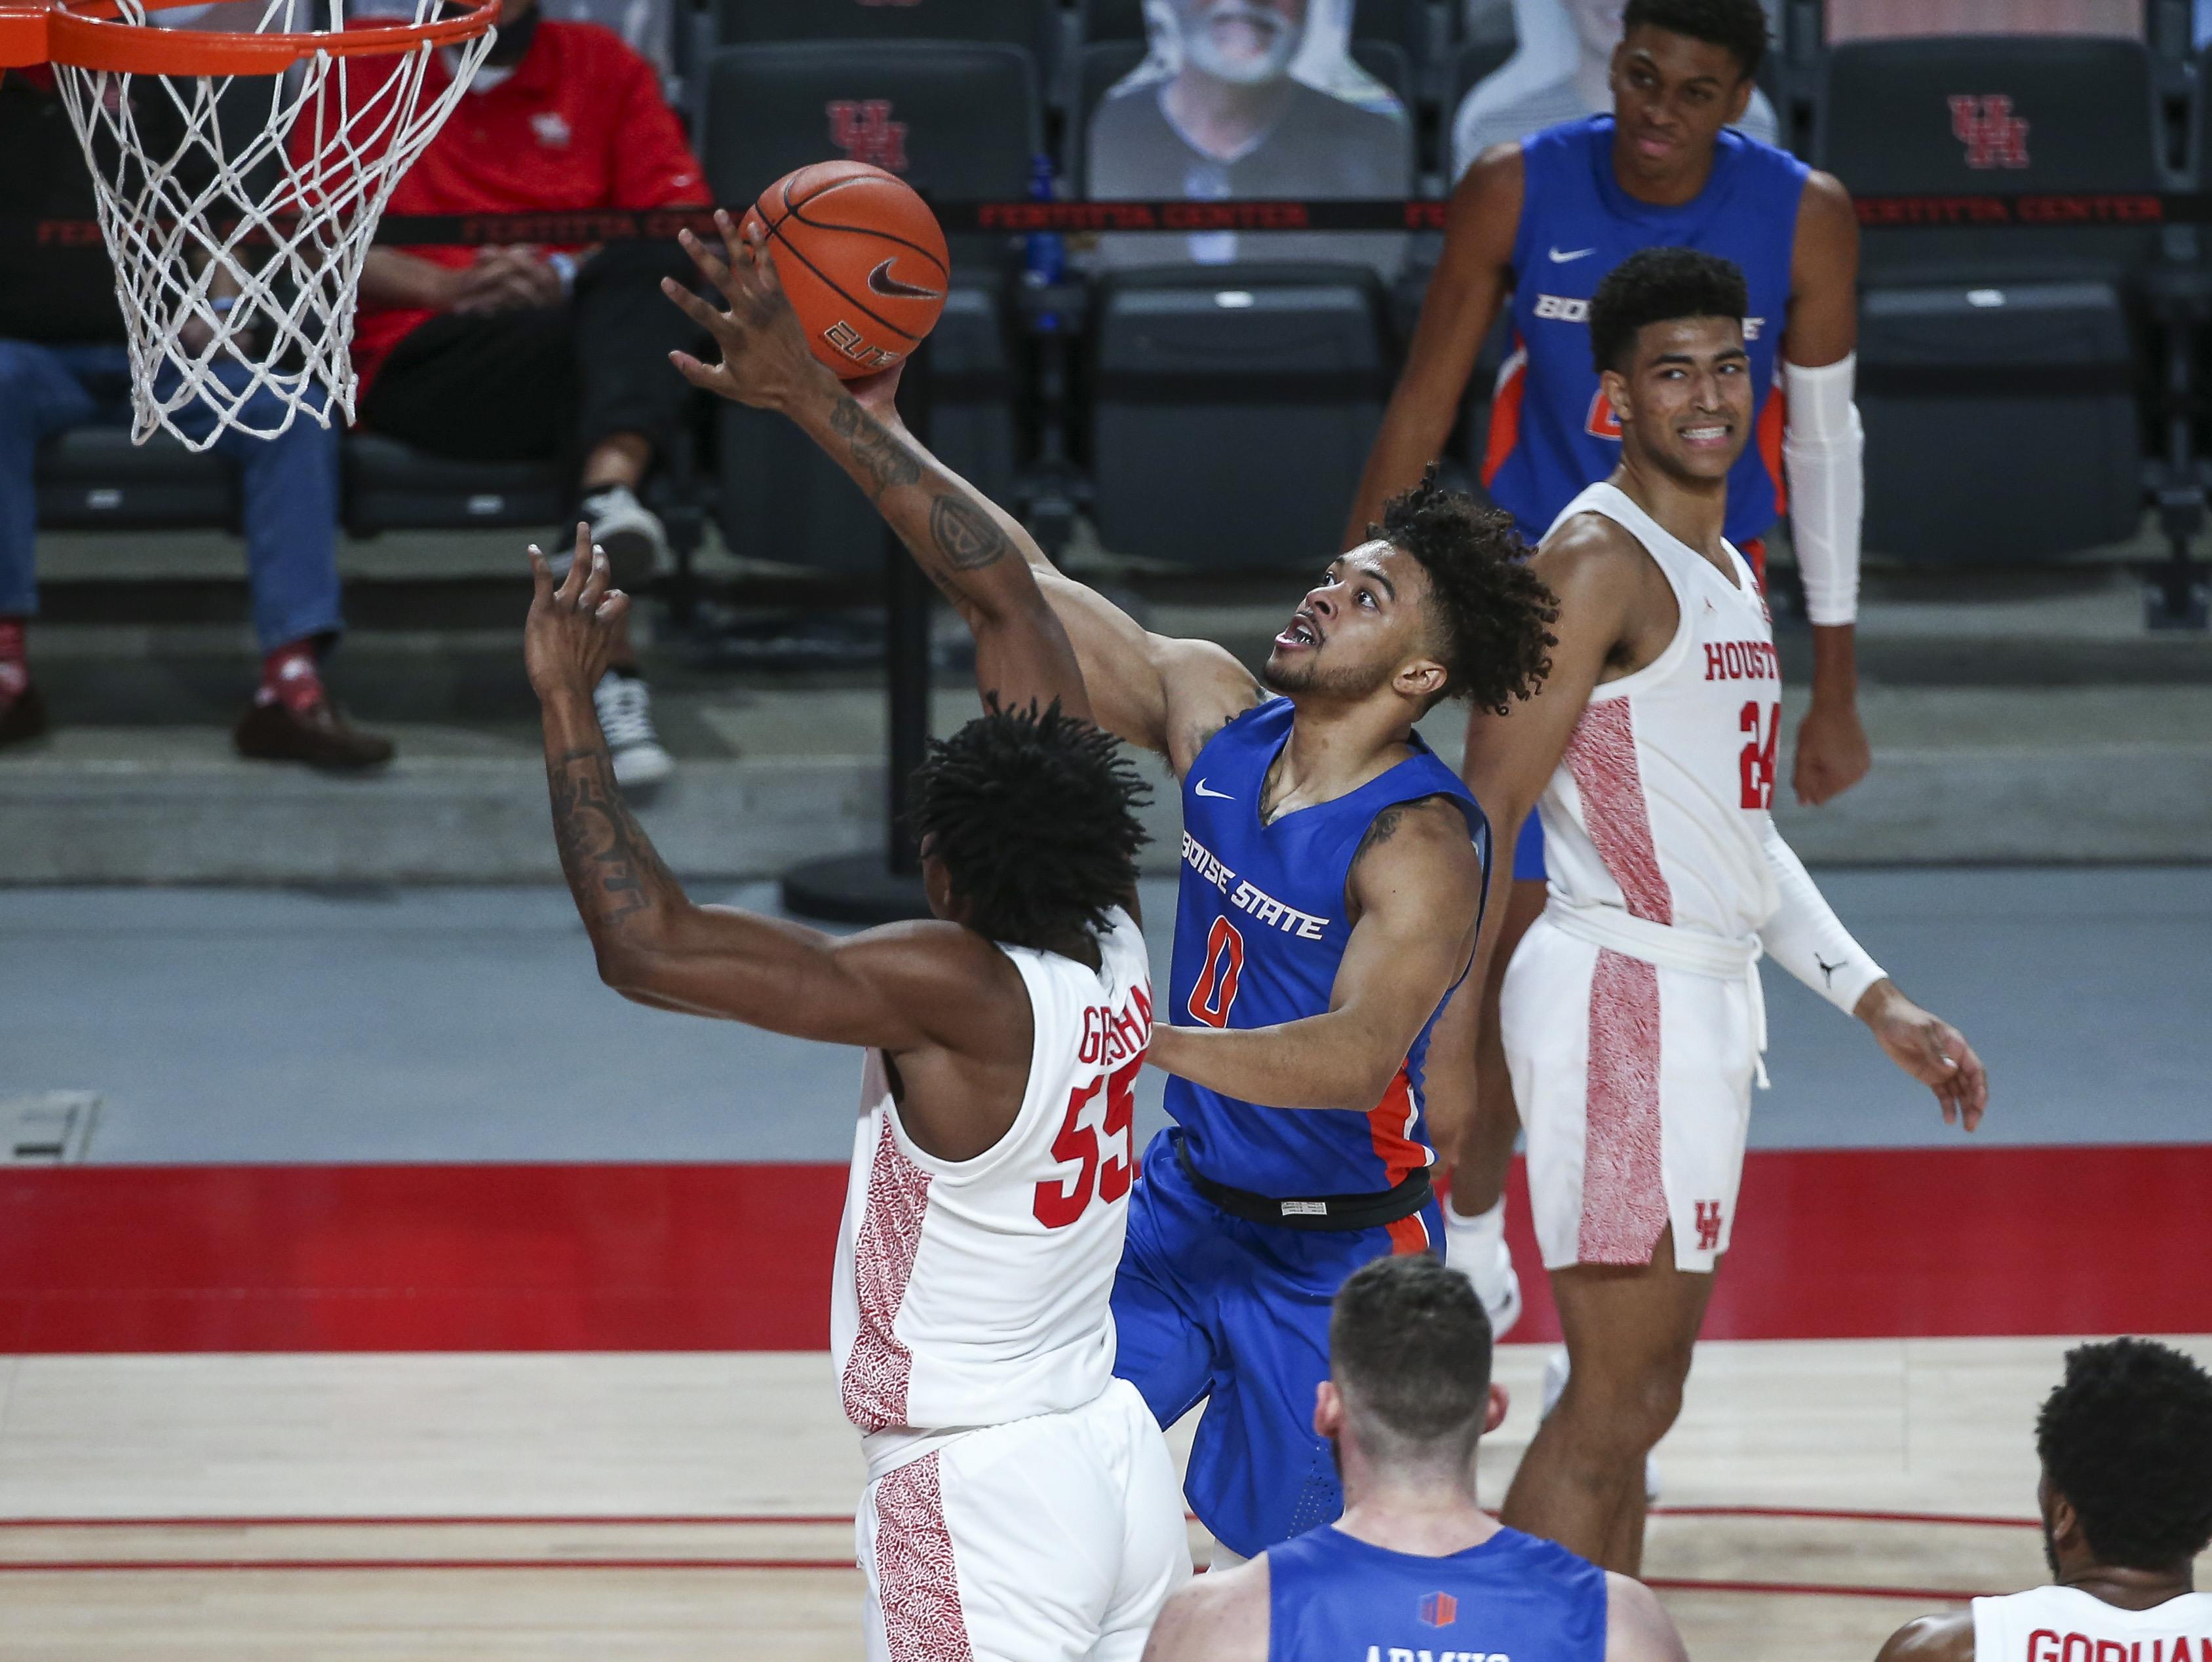 NCAA Basketball: Boise State at Houston